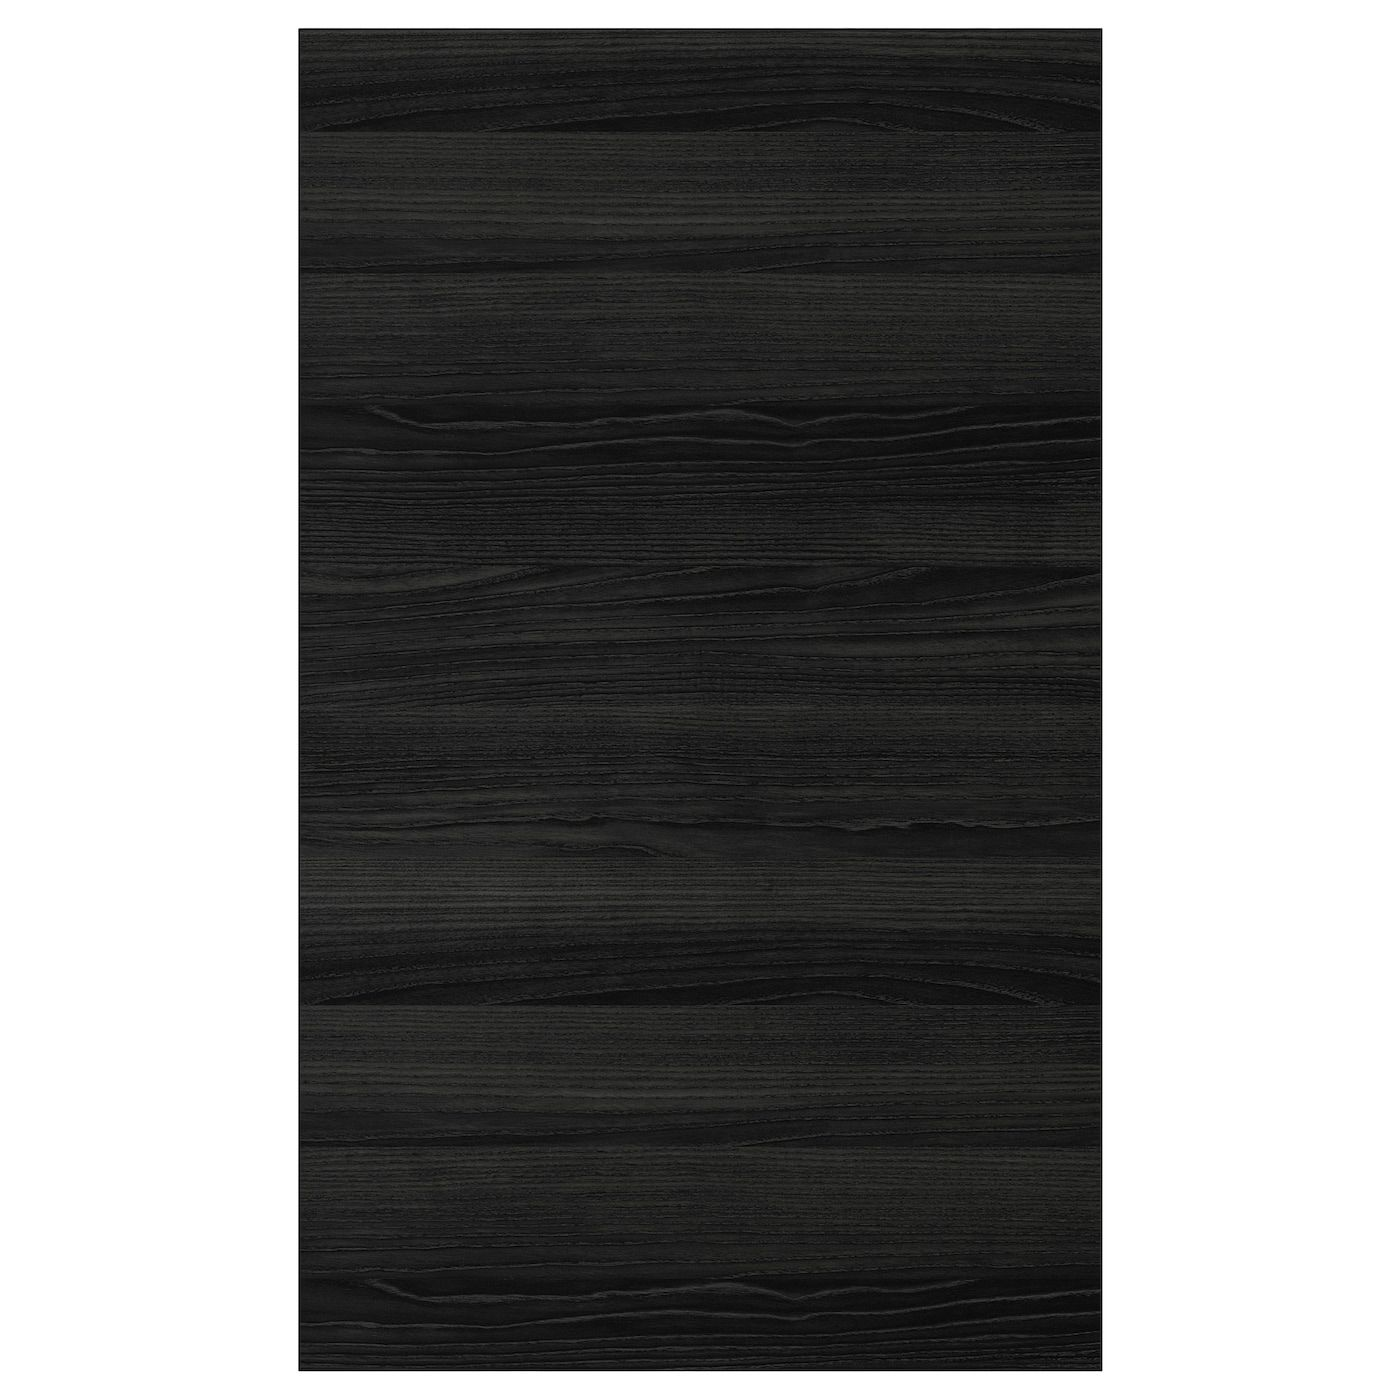 Tingsryd Porte Effet Bois Noir 60x100 Cm In 2020 Wood Doors